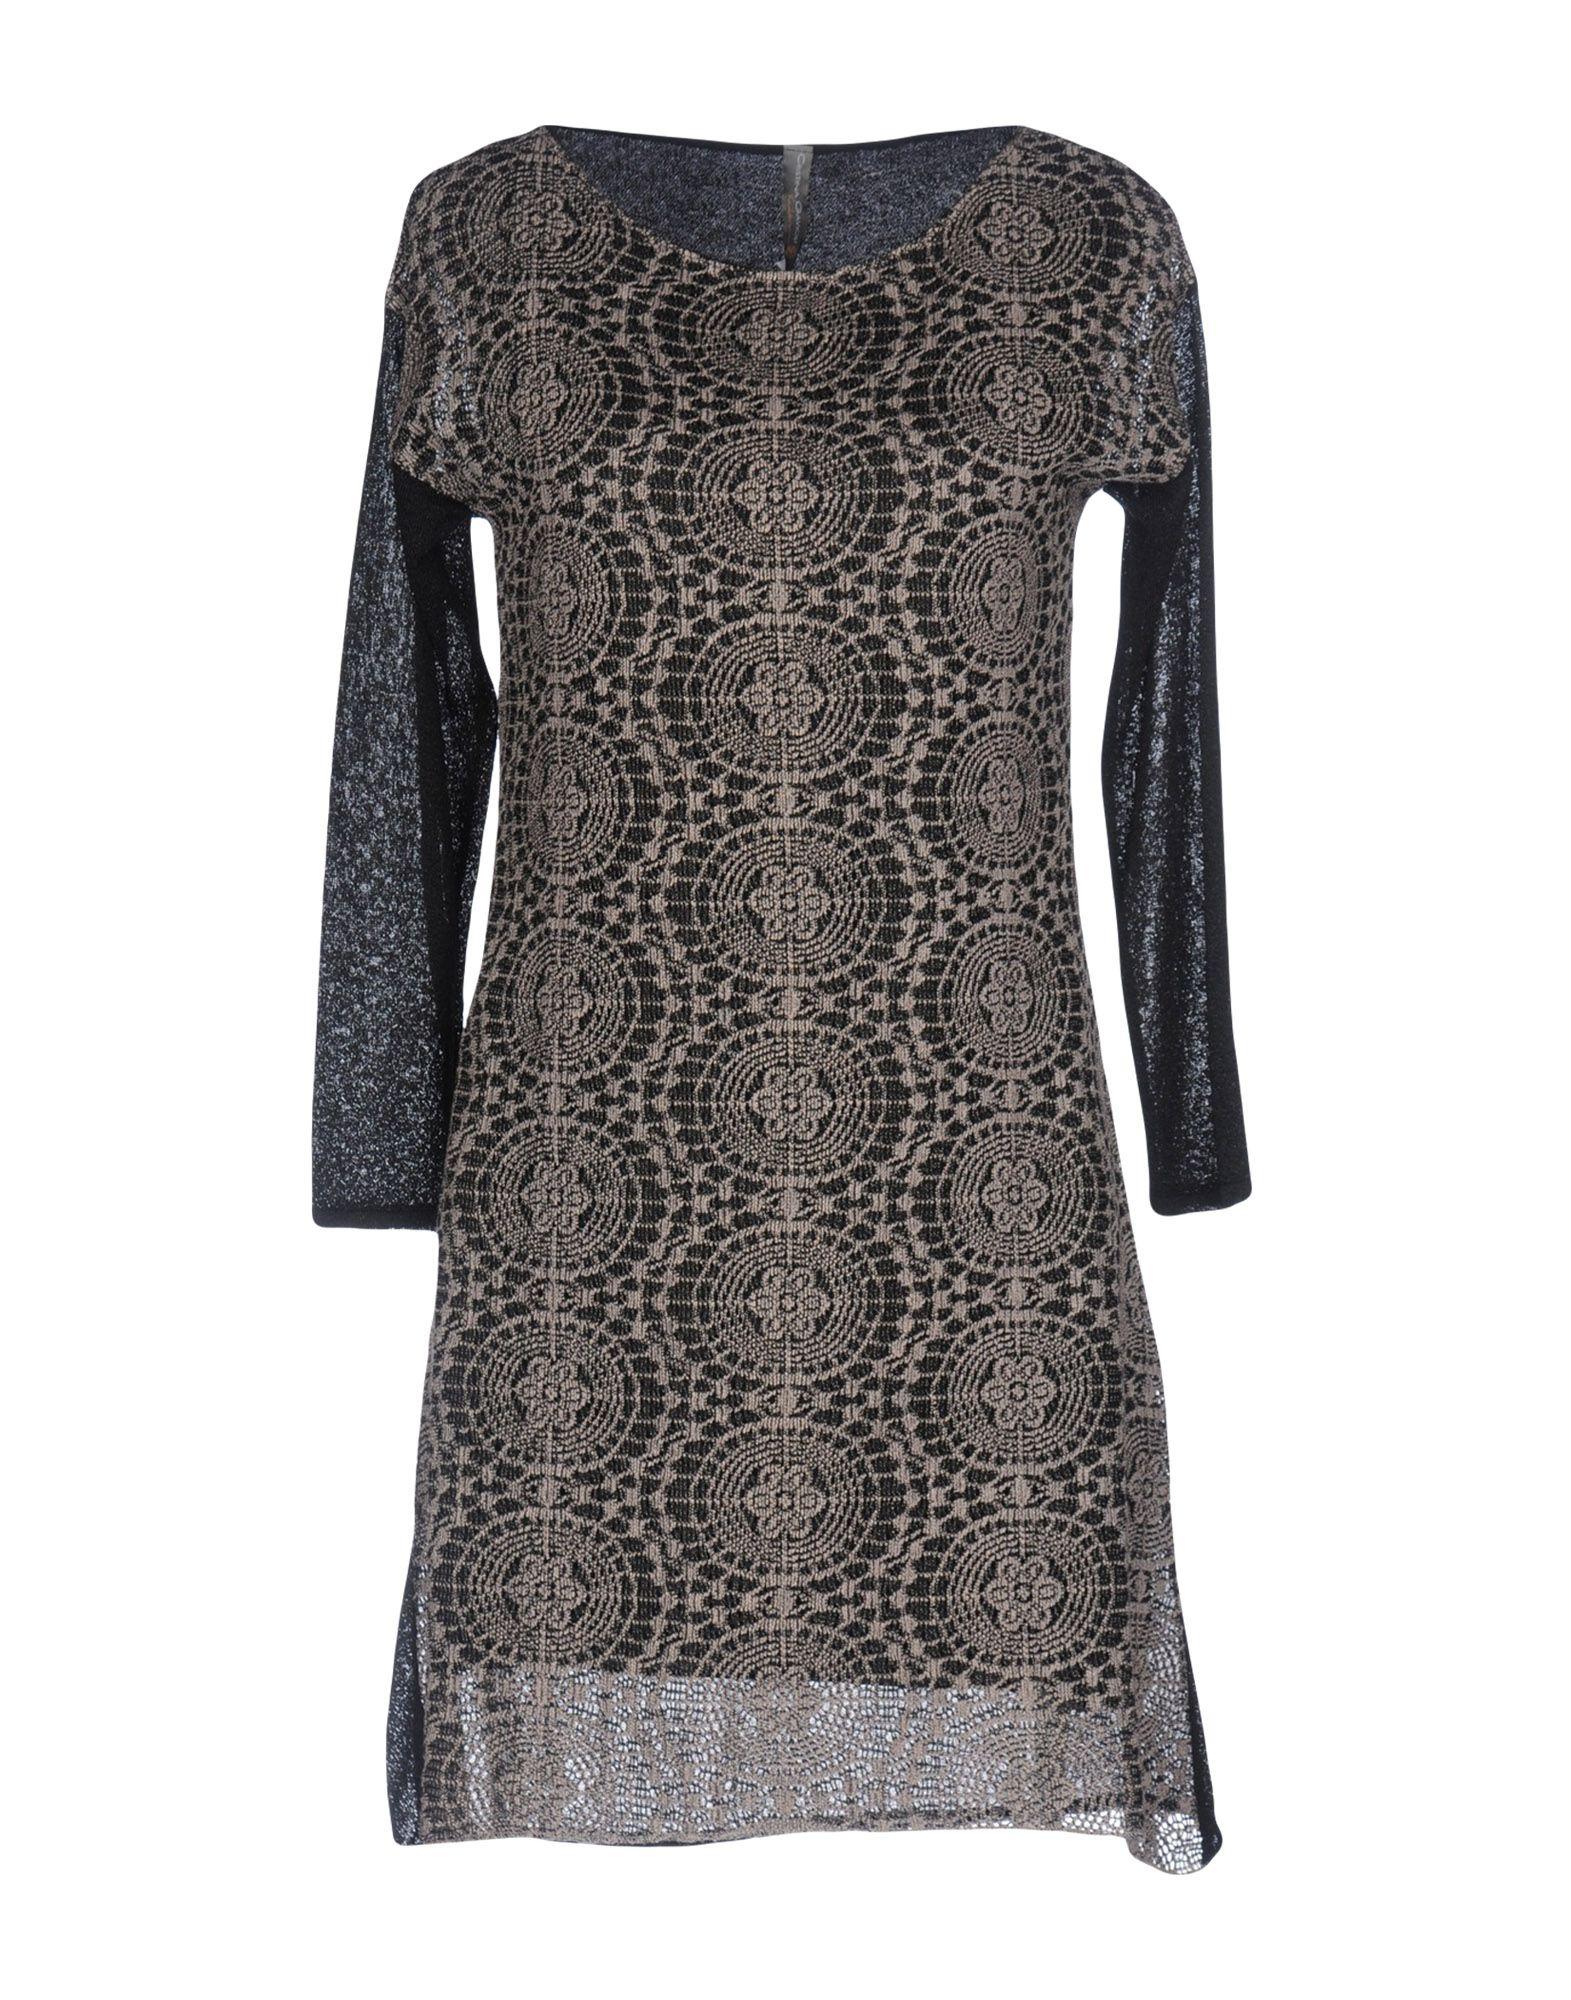 CRISTINA GAVIOLI Короткое платье платье cristina gavioli платья и сарафаны мини короткие